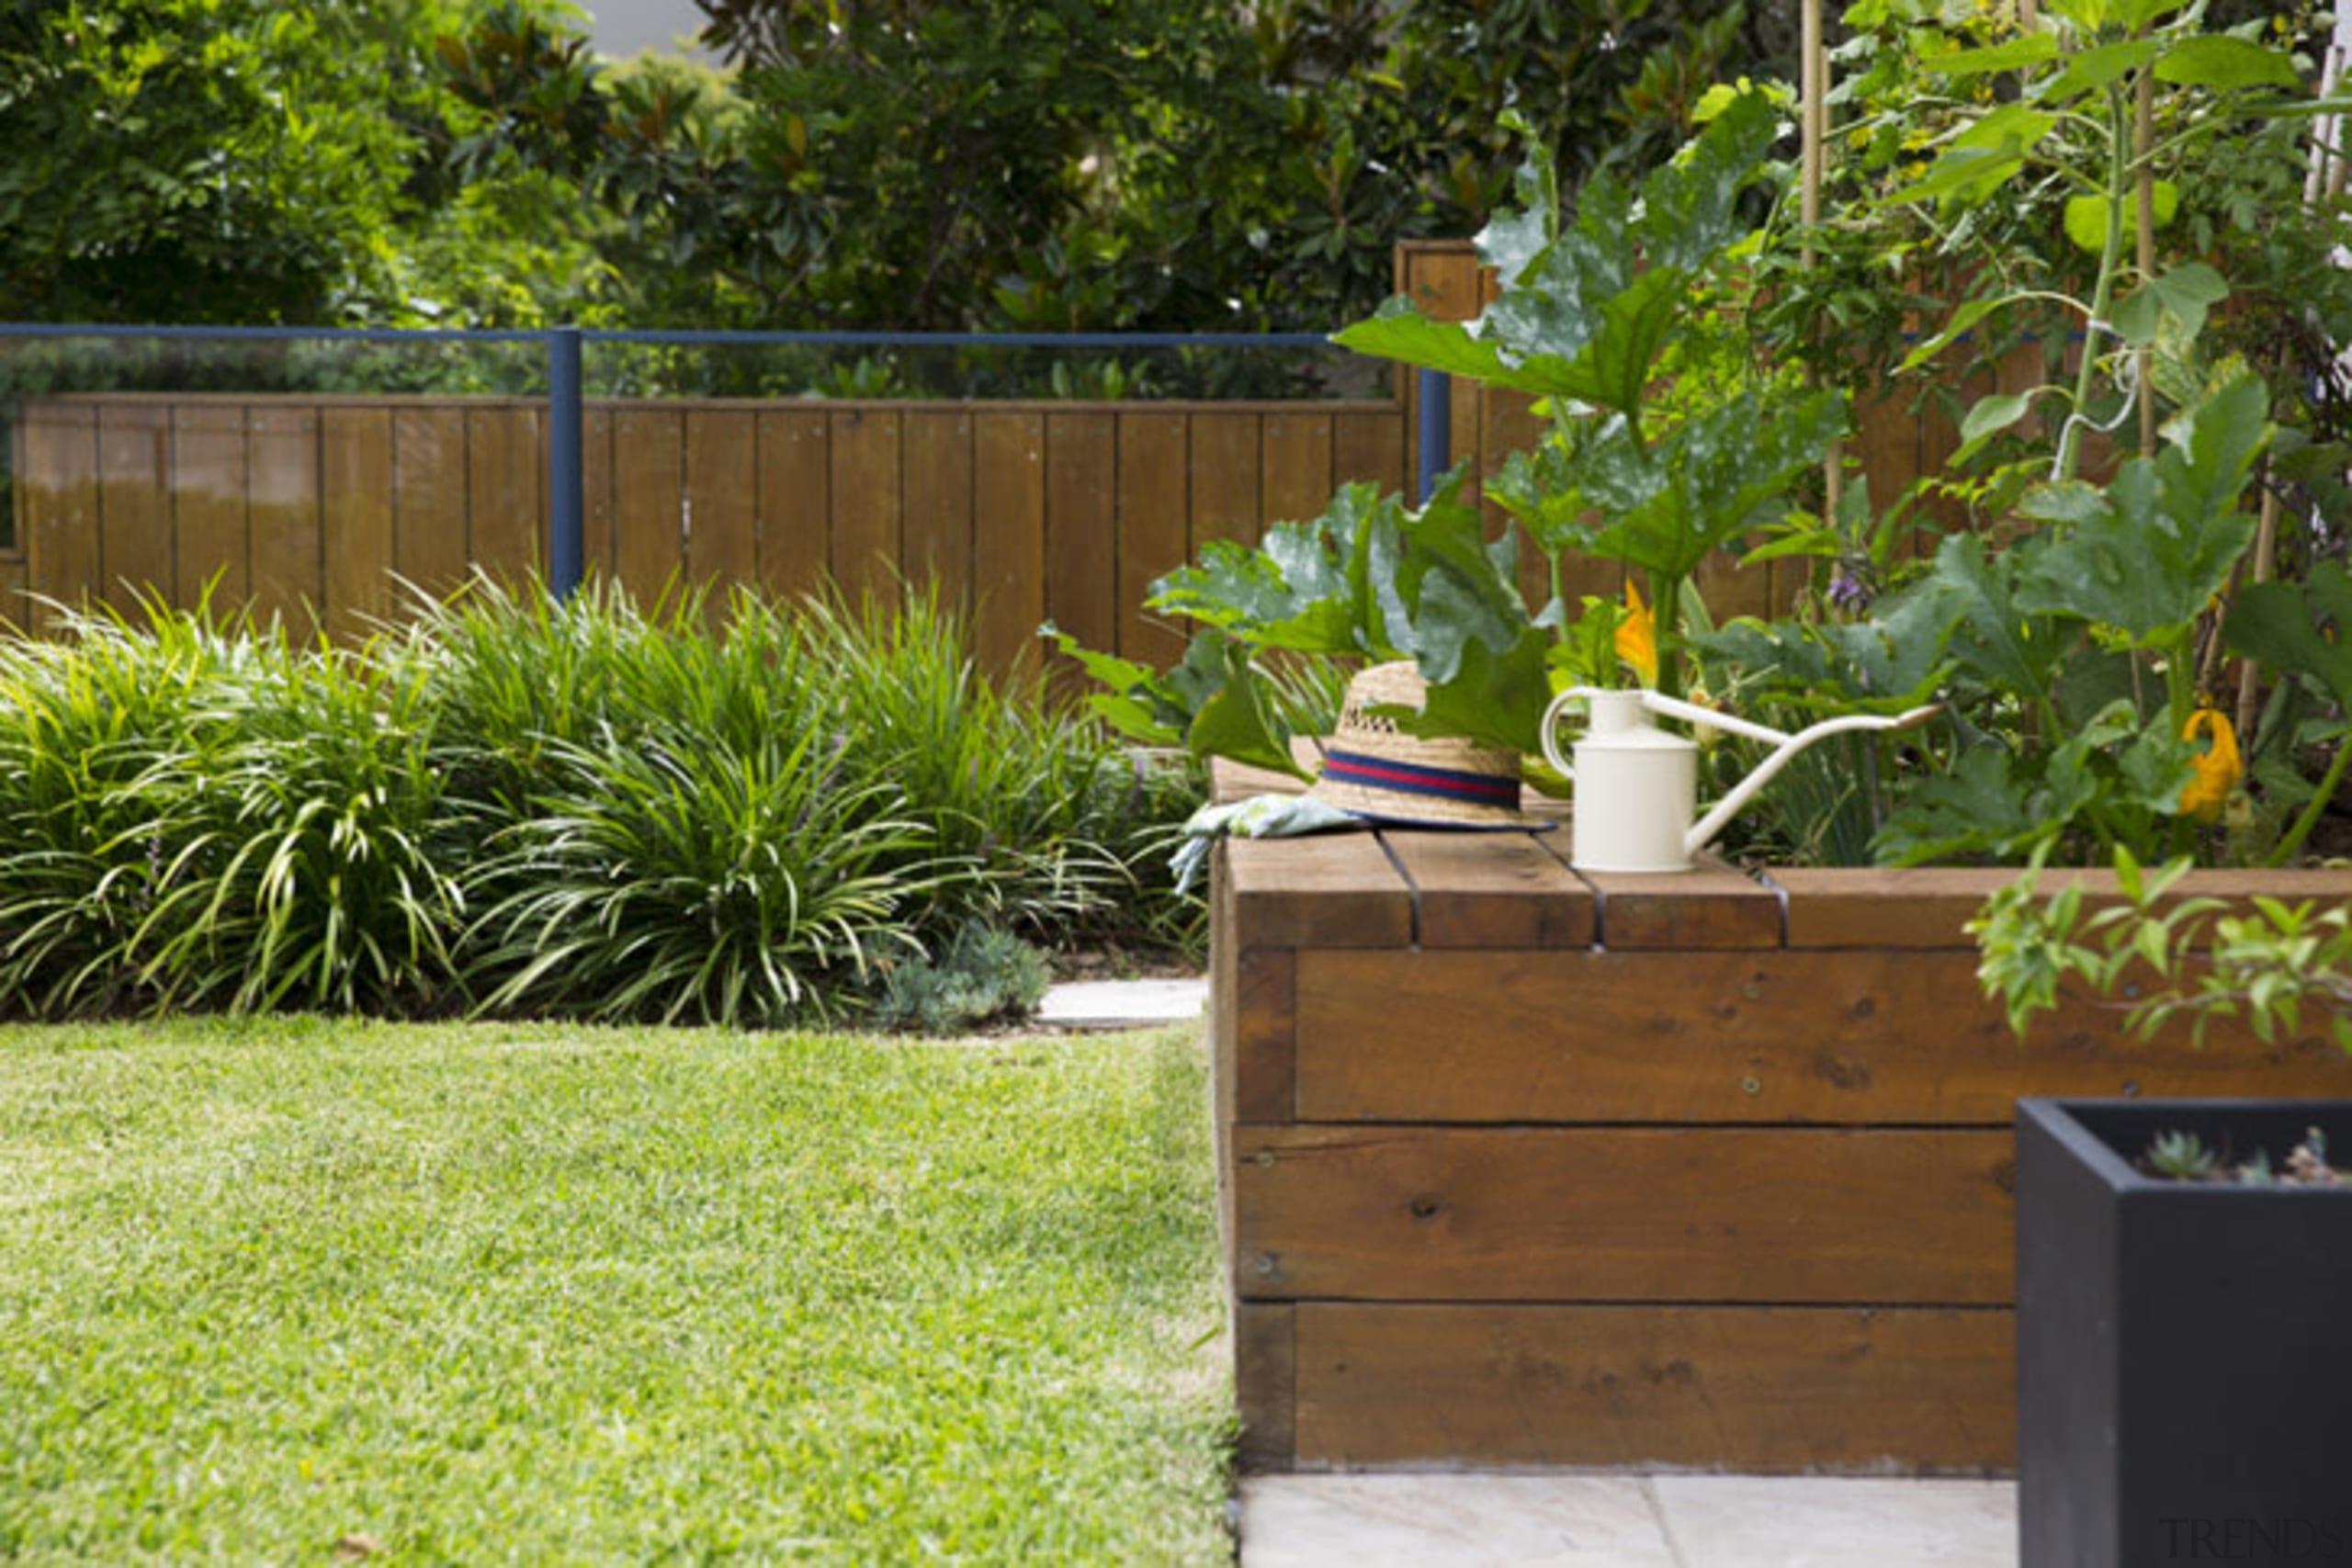 Vegie Patch By Landart Landscapes Credit Jason Busch backyard, fence, garden, grass, landscape, landscaping, lawn, outdoor structure, plant, walkway, wood, yard, brown